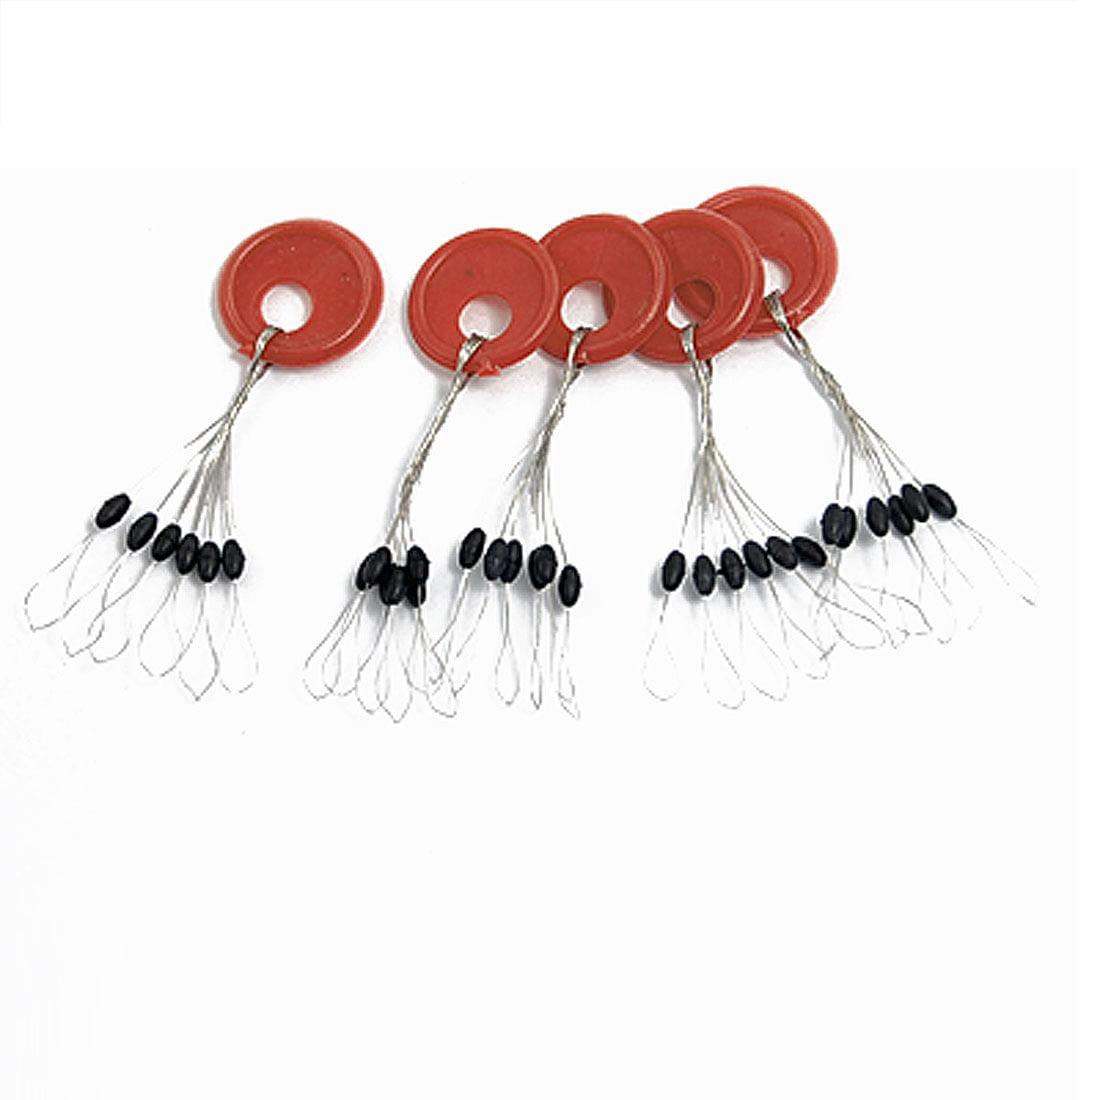 5 Pcs Mini 6 in 1 Black Plastic Bobber Fishing Tackle by